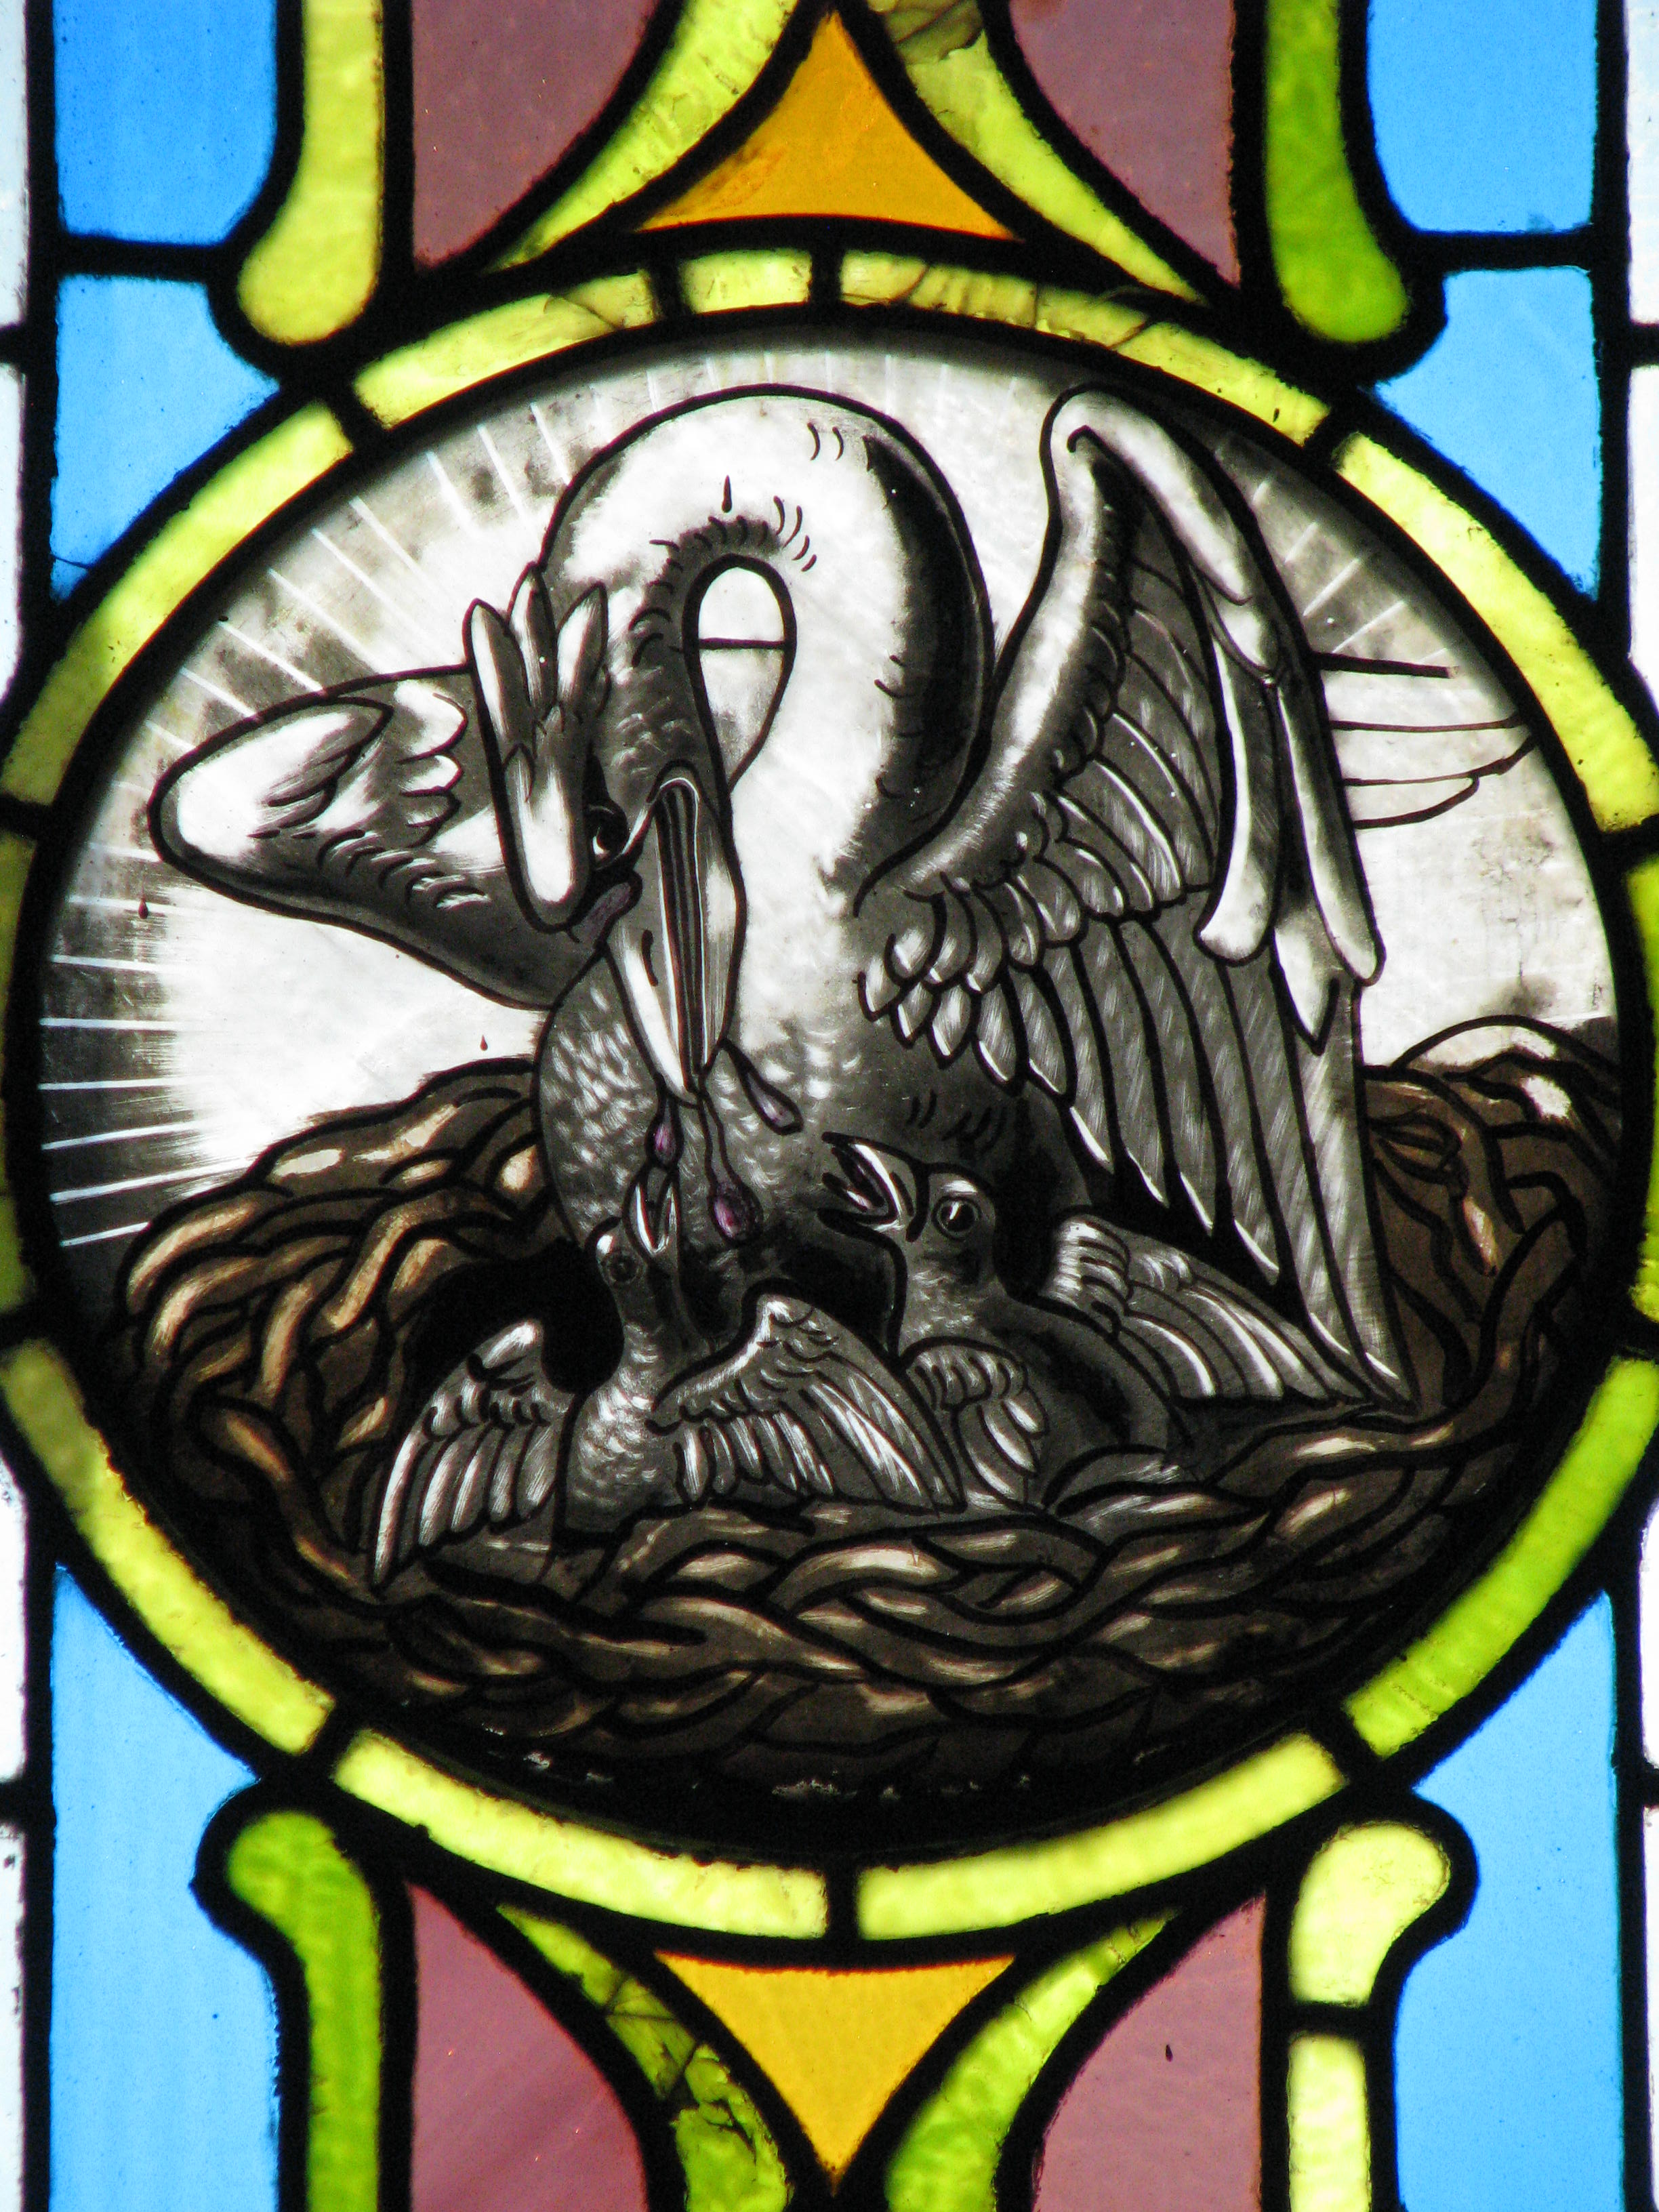 Sacred Symbols The Pelican Mandorlas In Our Midst